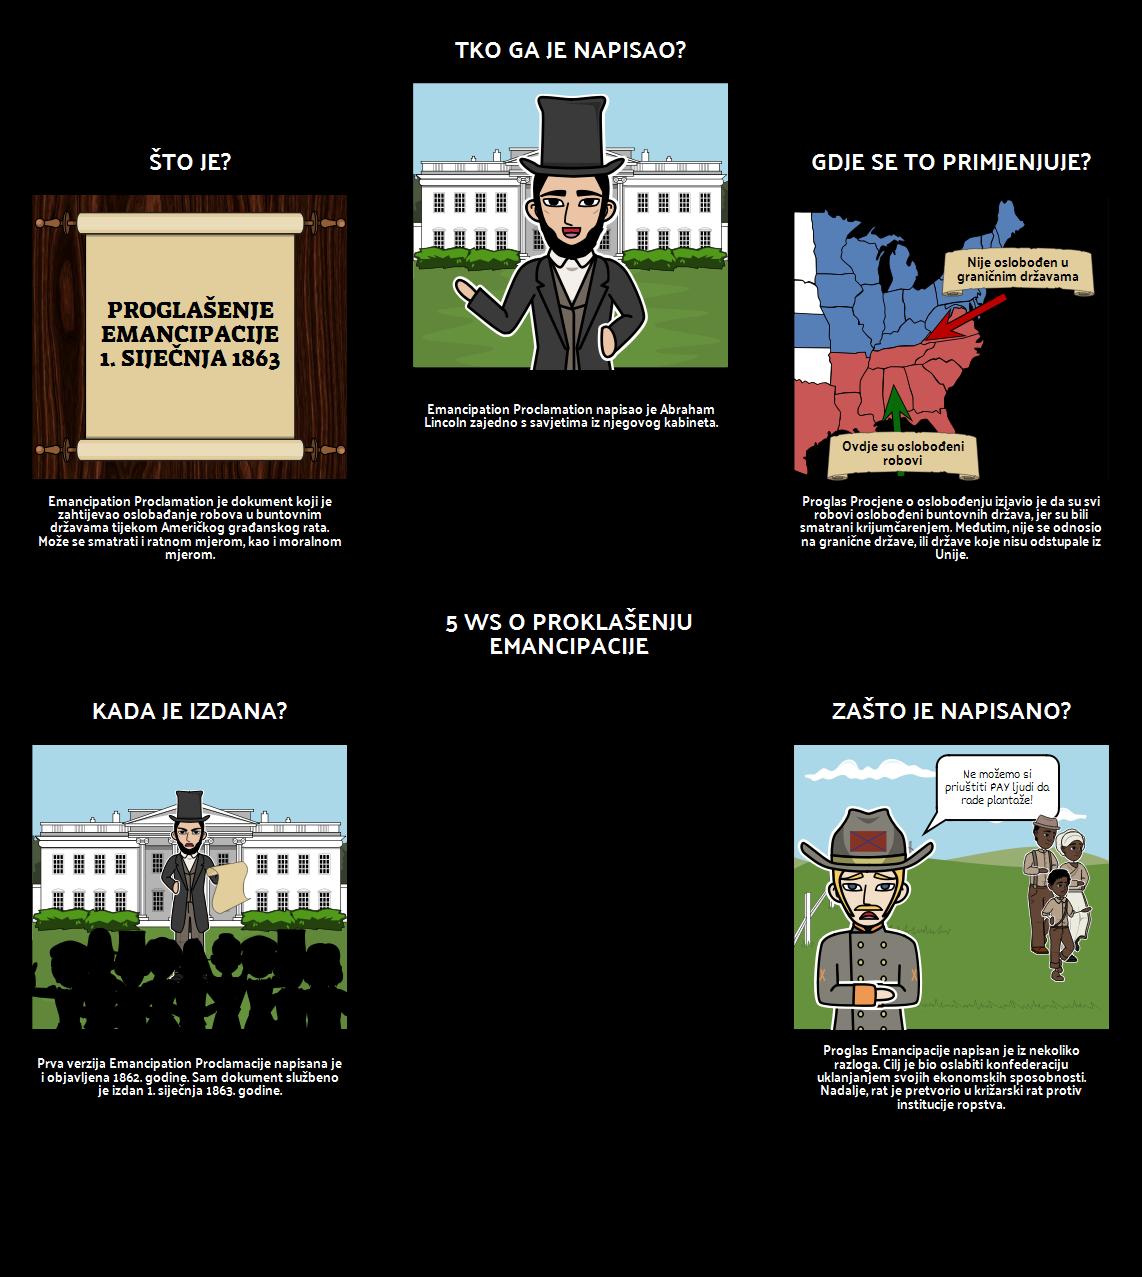 Procjena o Emancipaciji 5 Ws